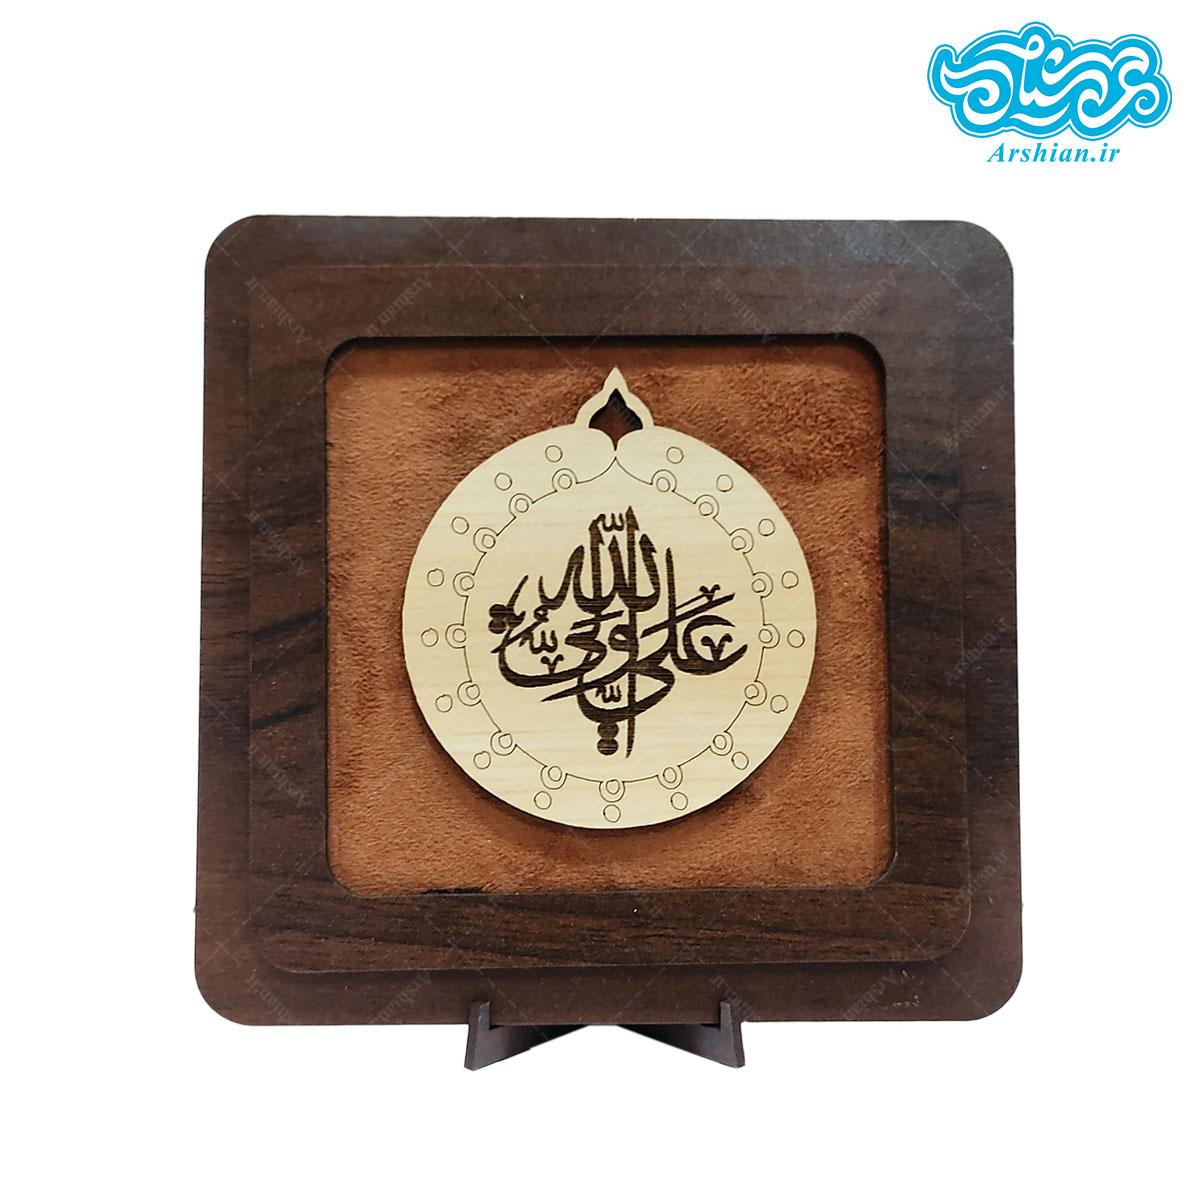 تندیس علی ولی الله طرح زمینه مخمل کد001